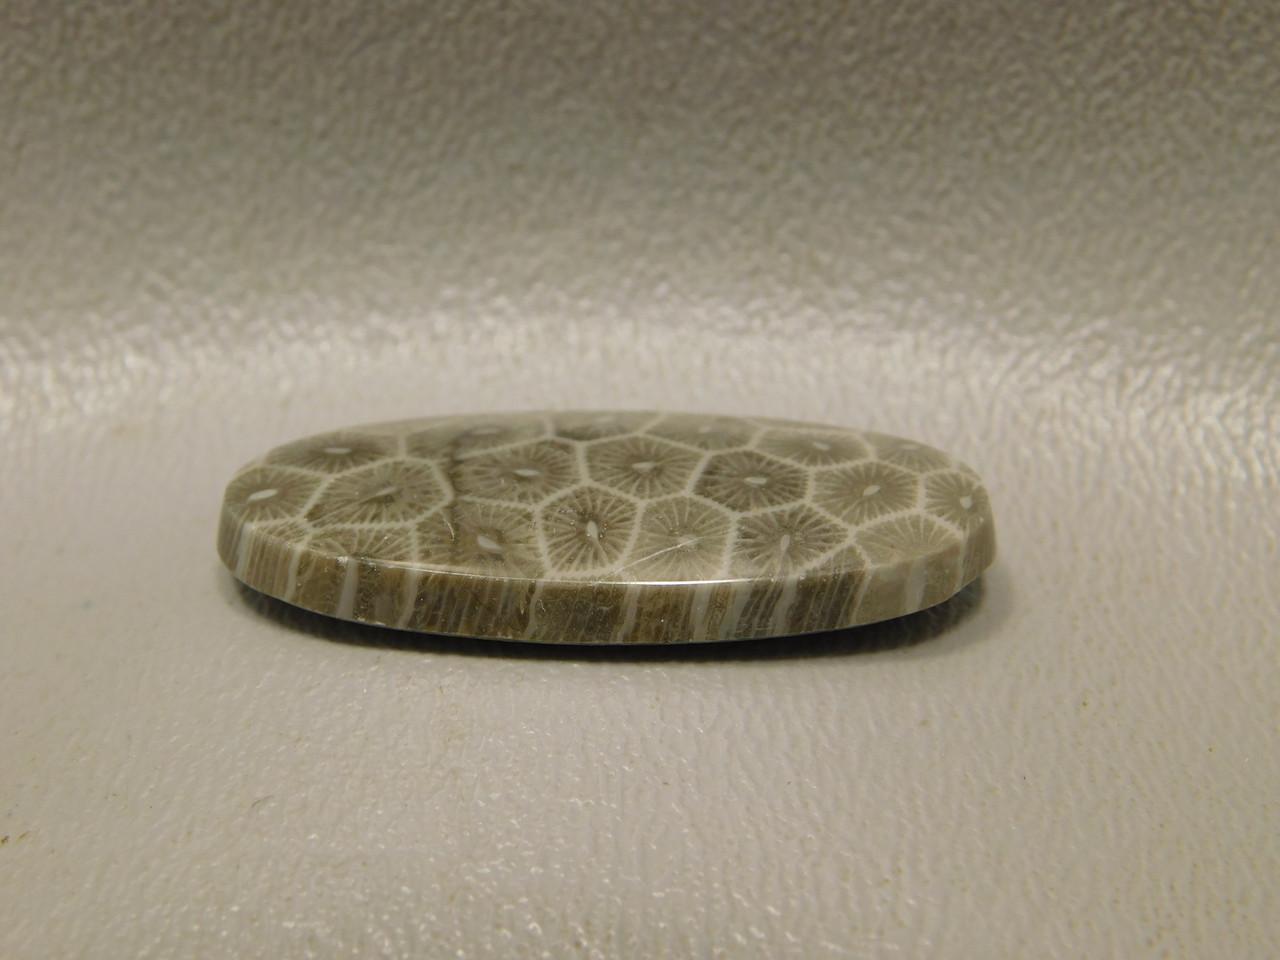 Flower Jasper Cabochon Flat Back Stone for Jewelry Design #F10